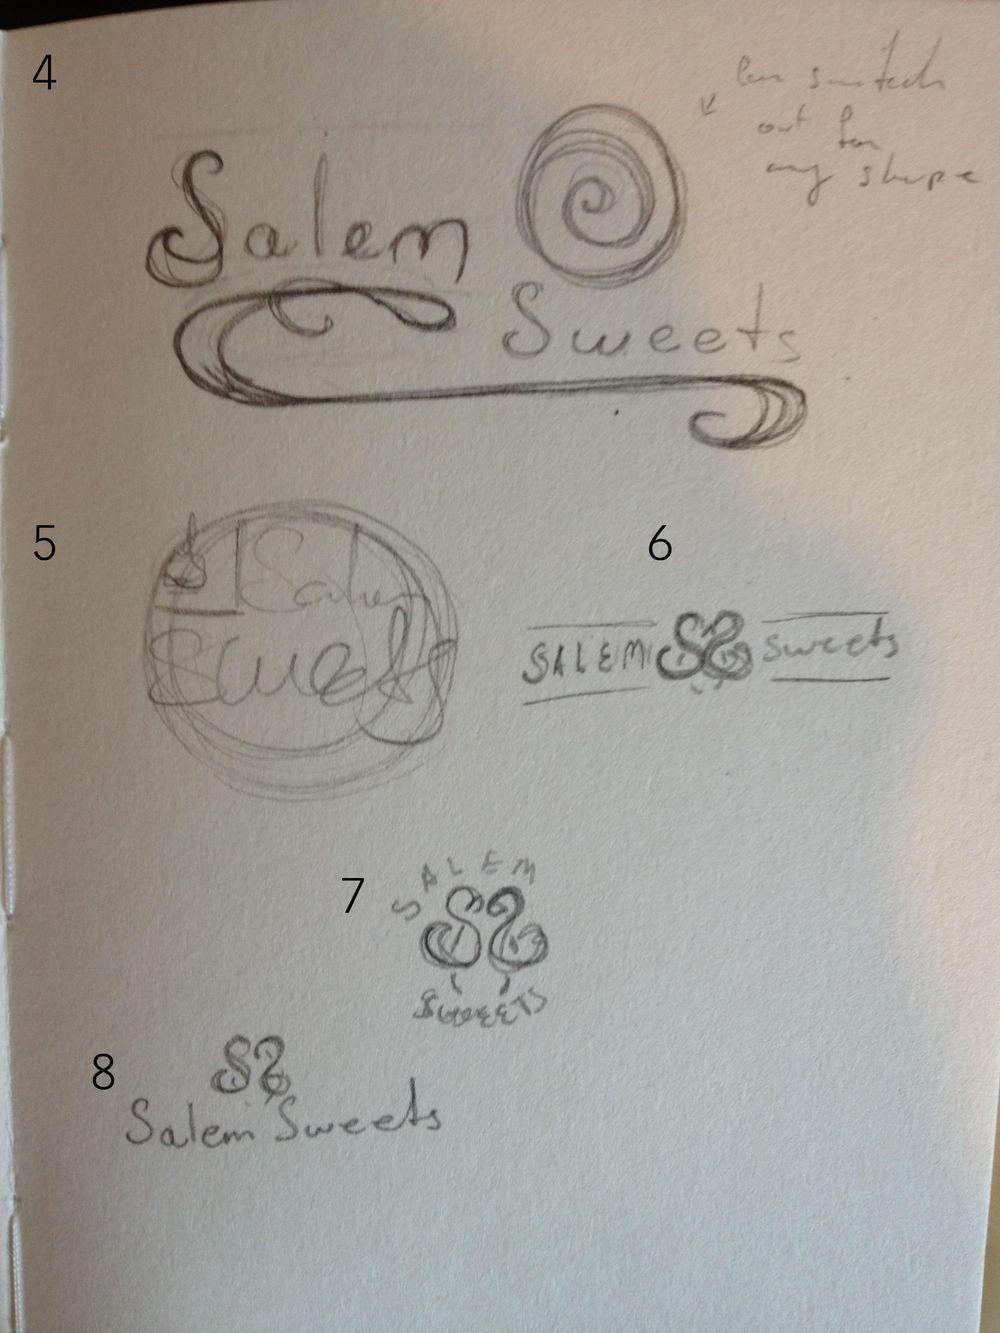 Salem Sweets - image 15 - student project